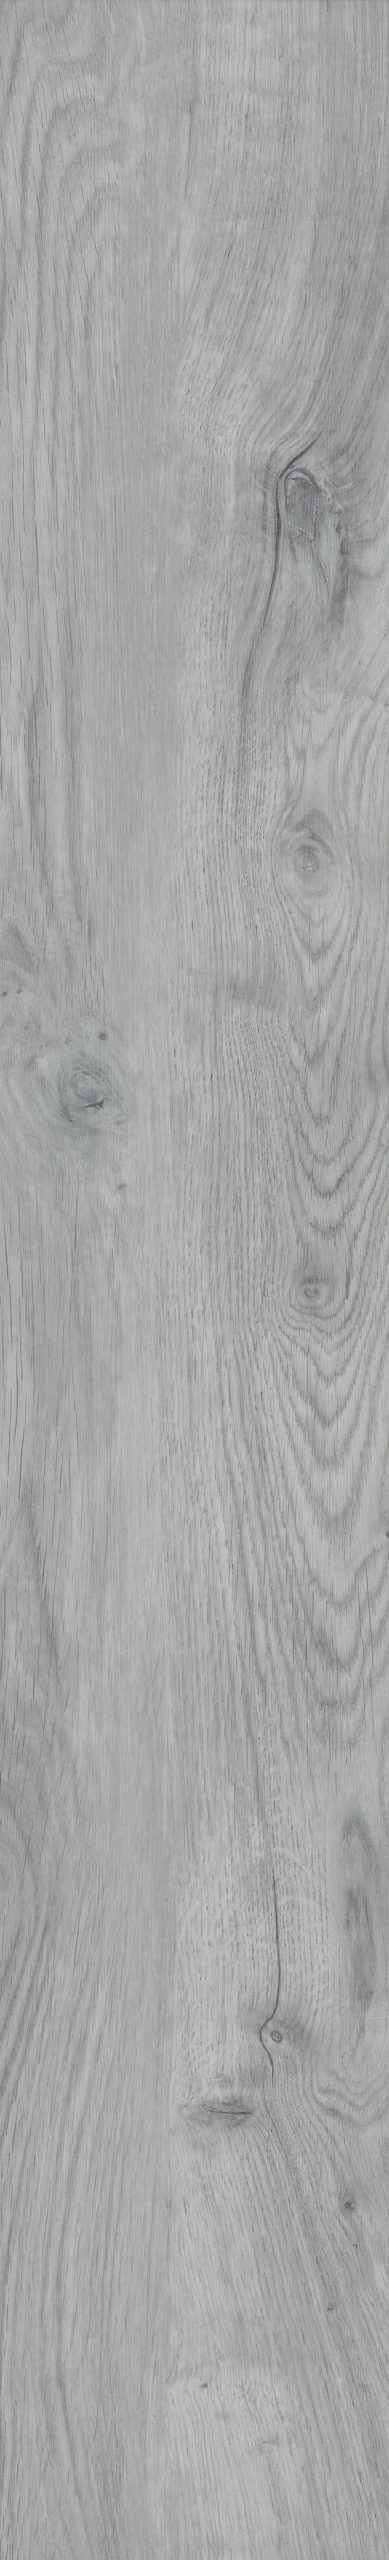 Bramber Chestnut Pippuria